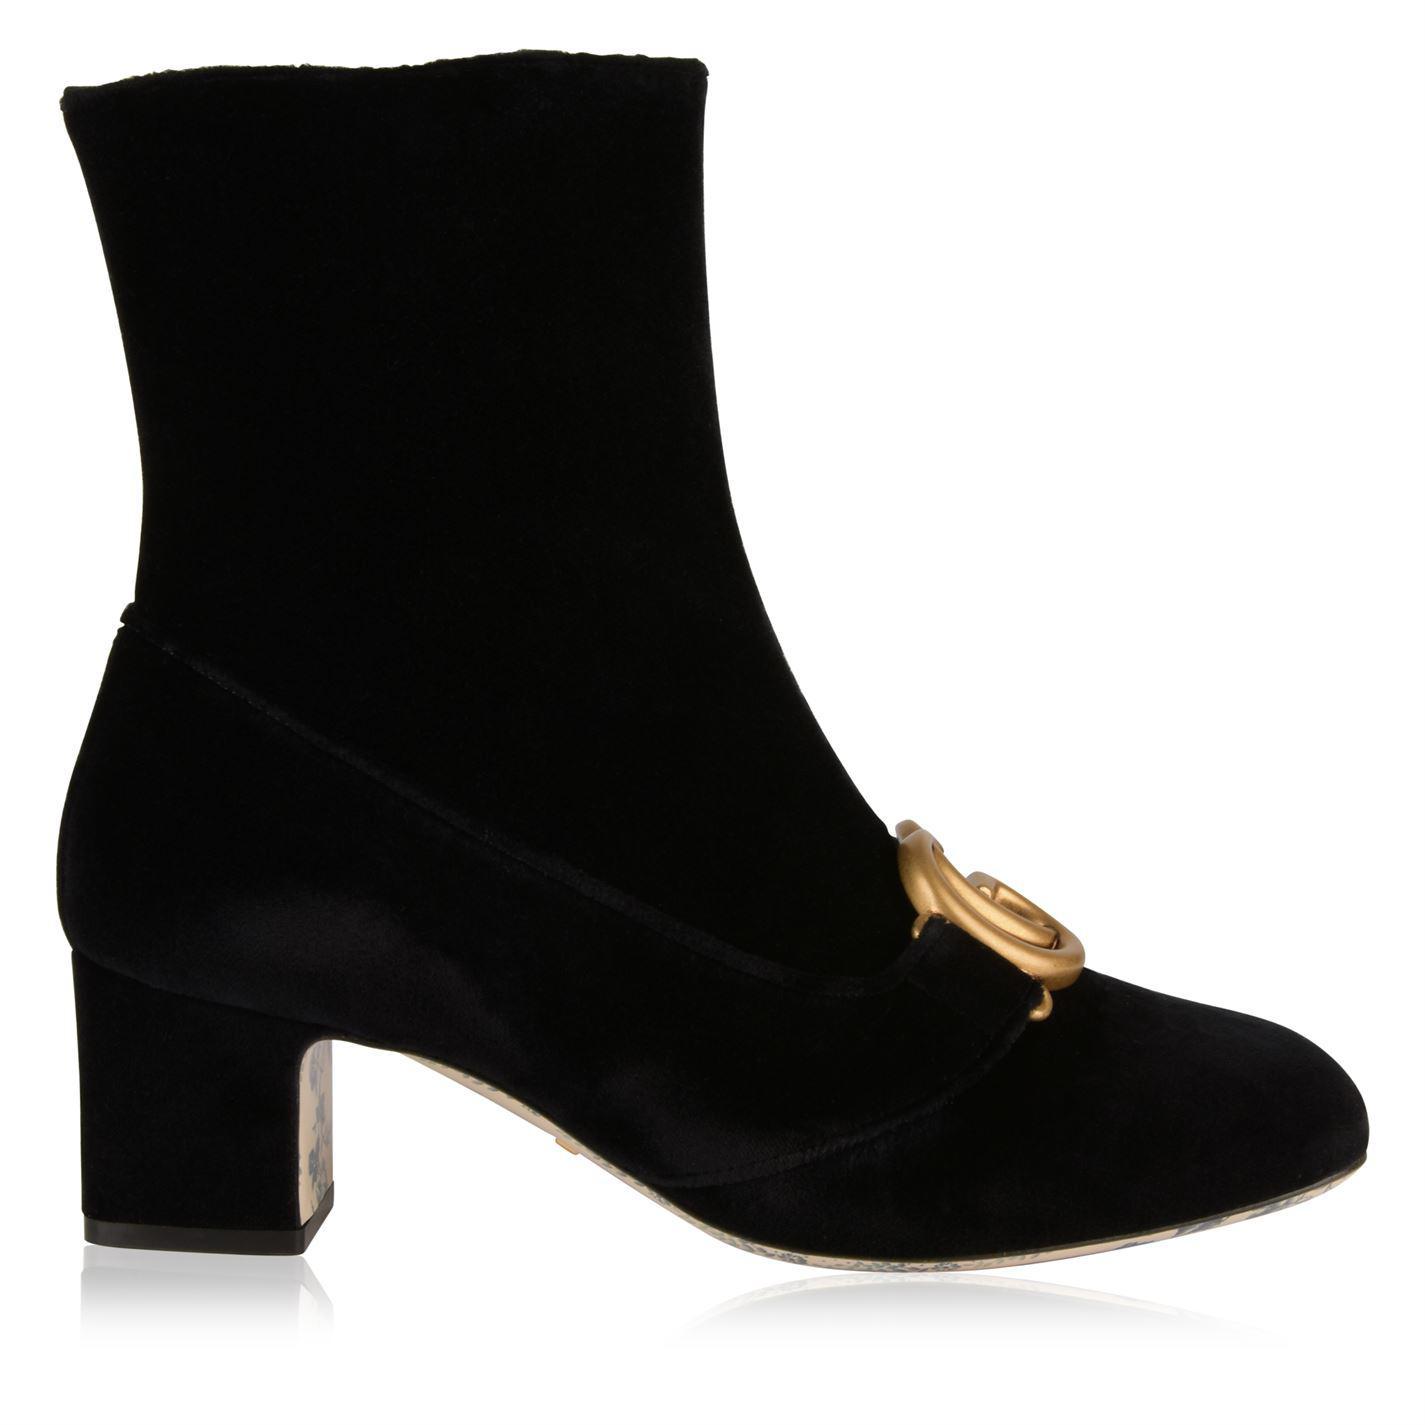 eae16f7e8e5 Gucci Victoire Gg Ankle Boots in Black - Lyst